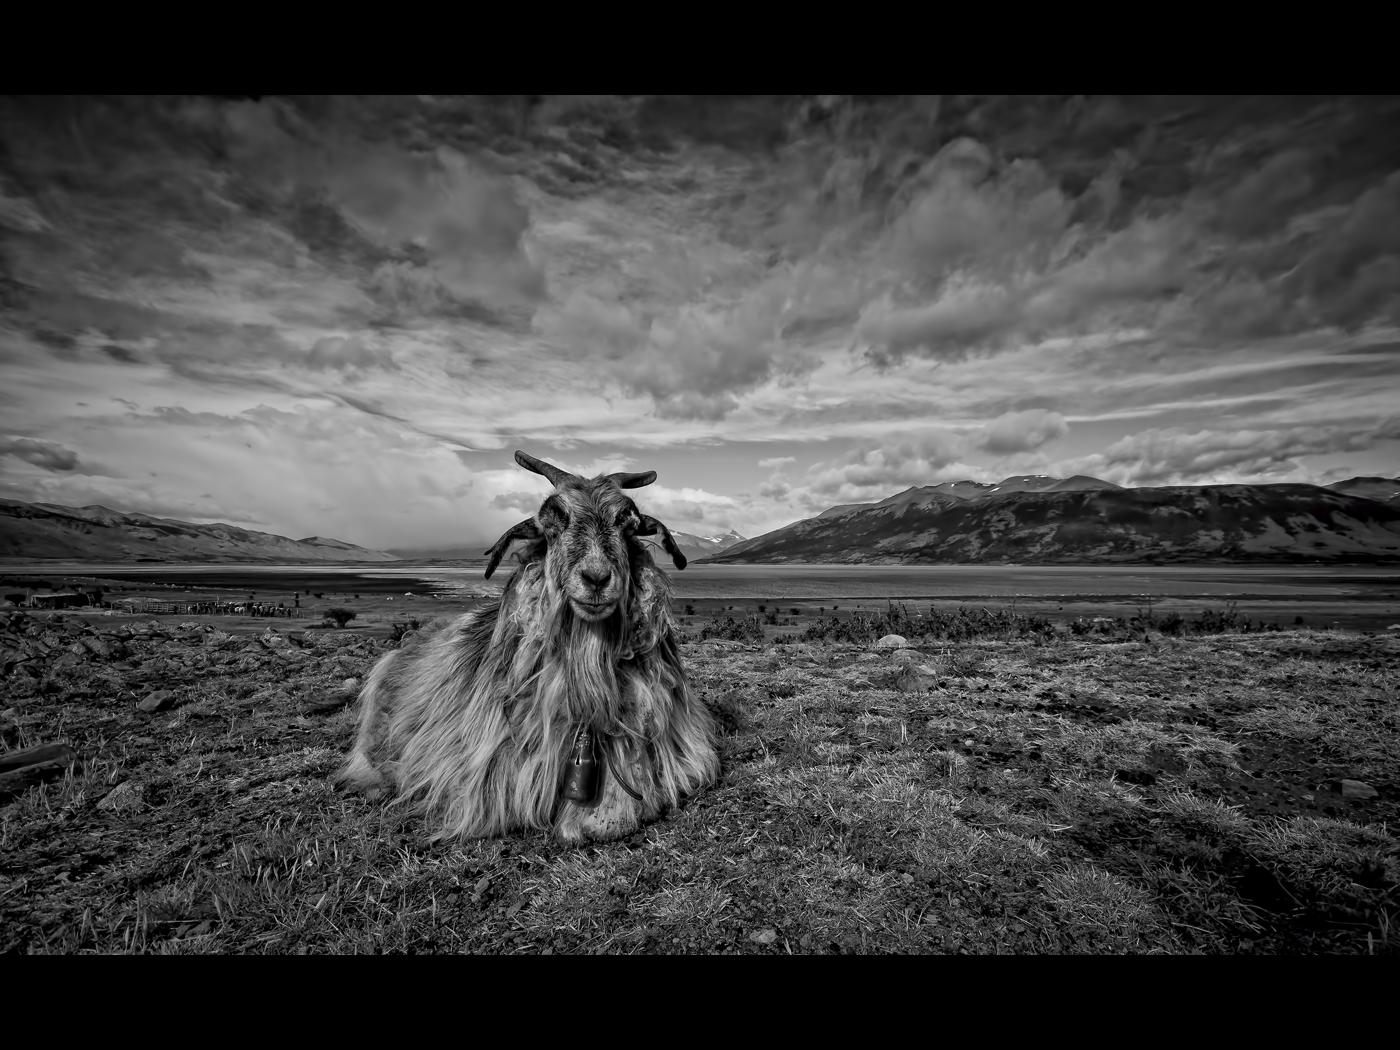 shaggy-goat-story